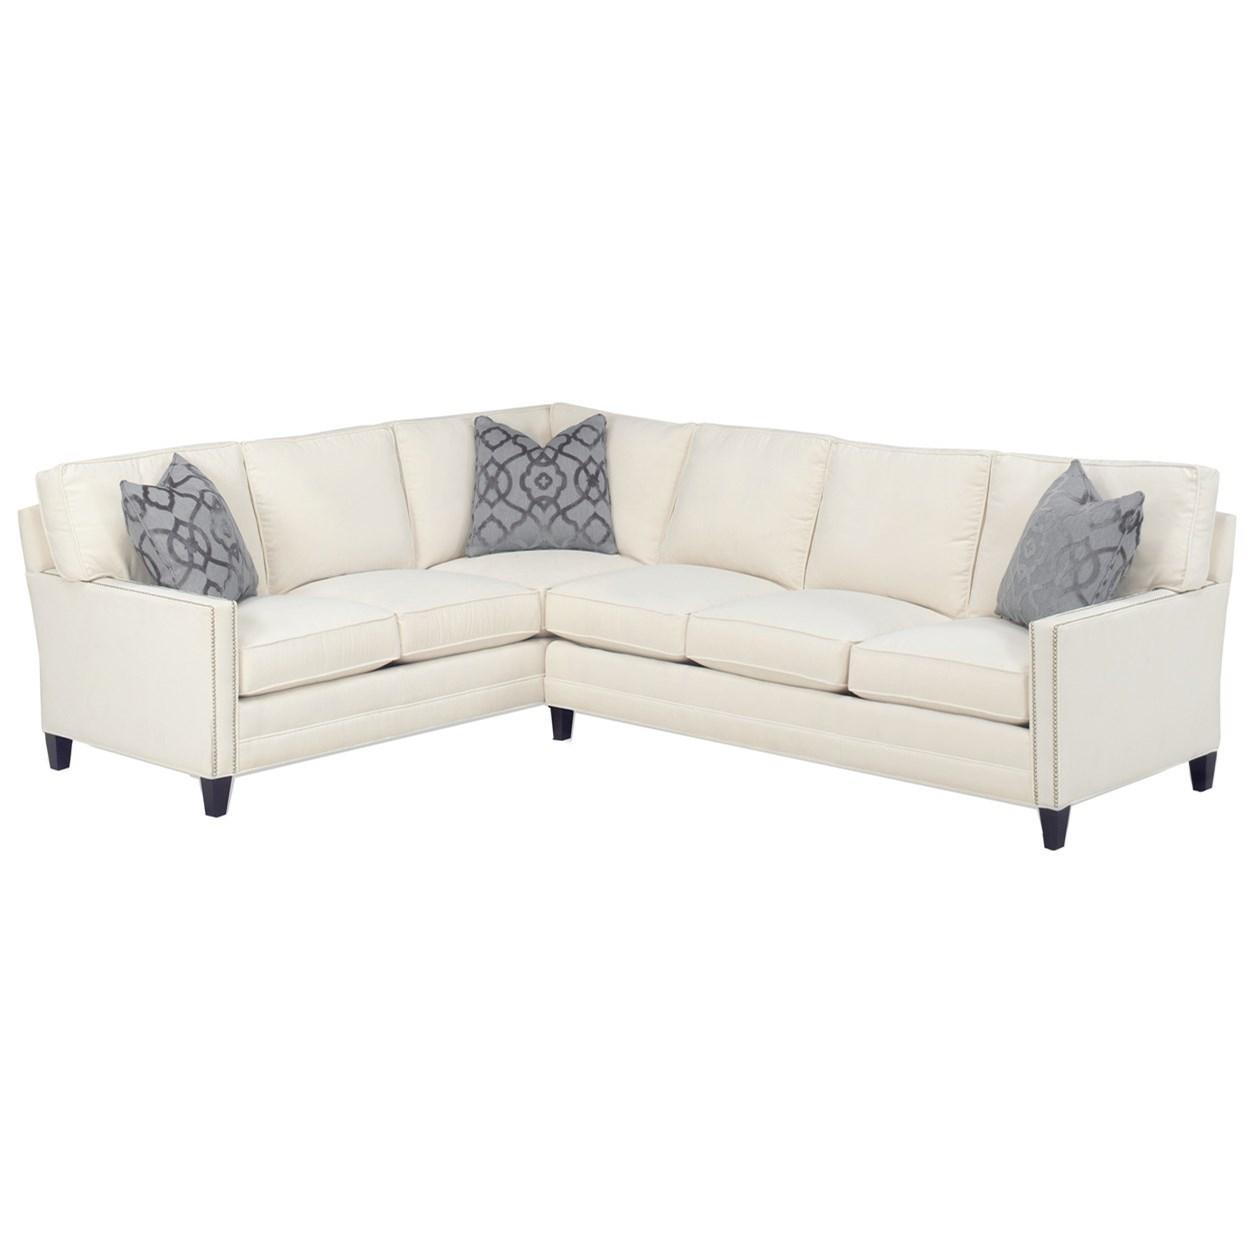 Lexington Personal Design Series Customizable Bristol 2 Pc Sectional W LAF Corner Sofa 3 Inch